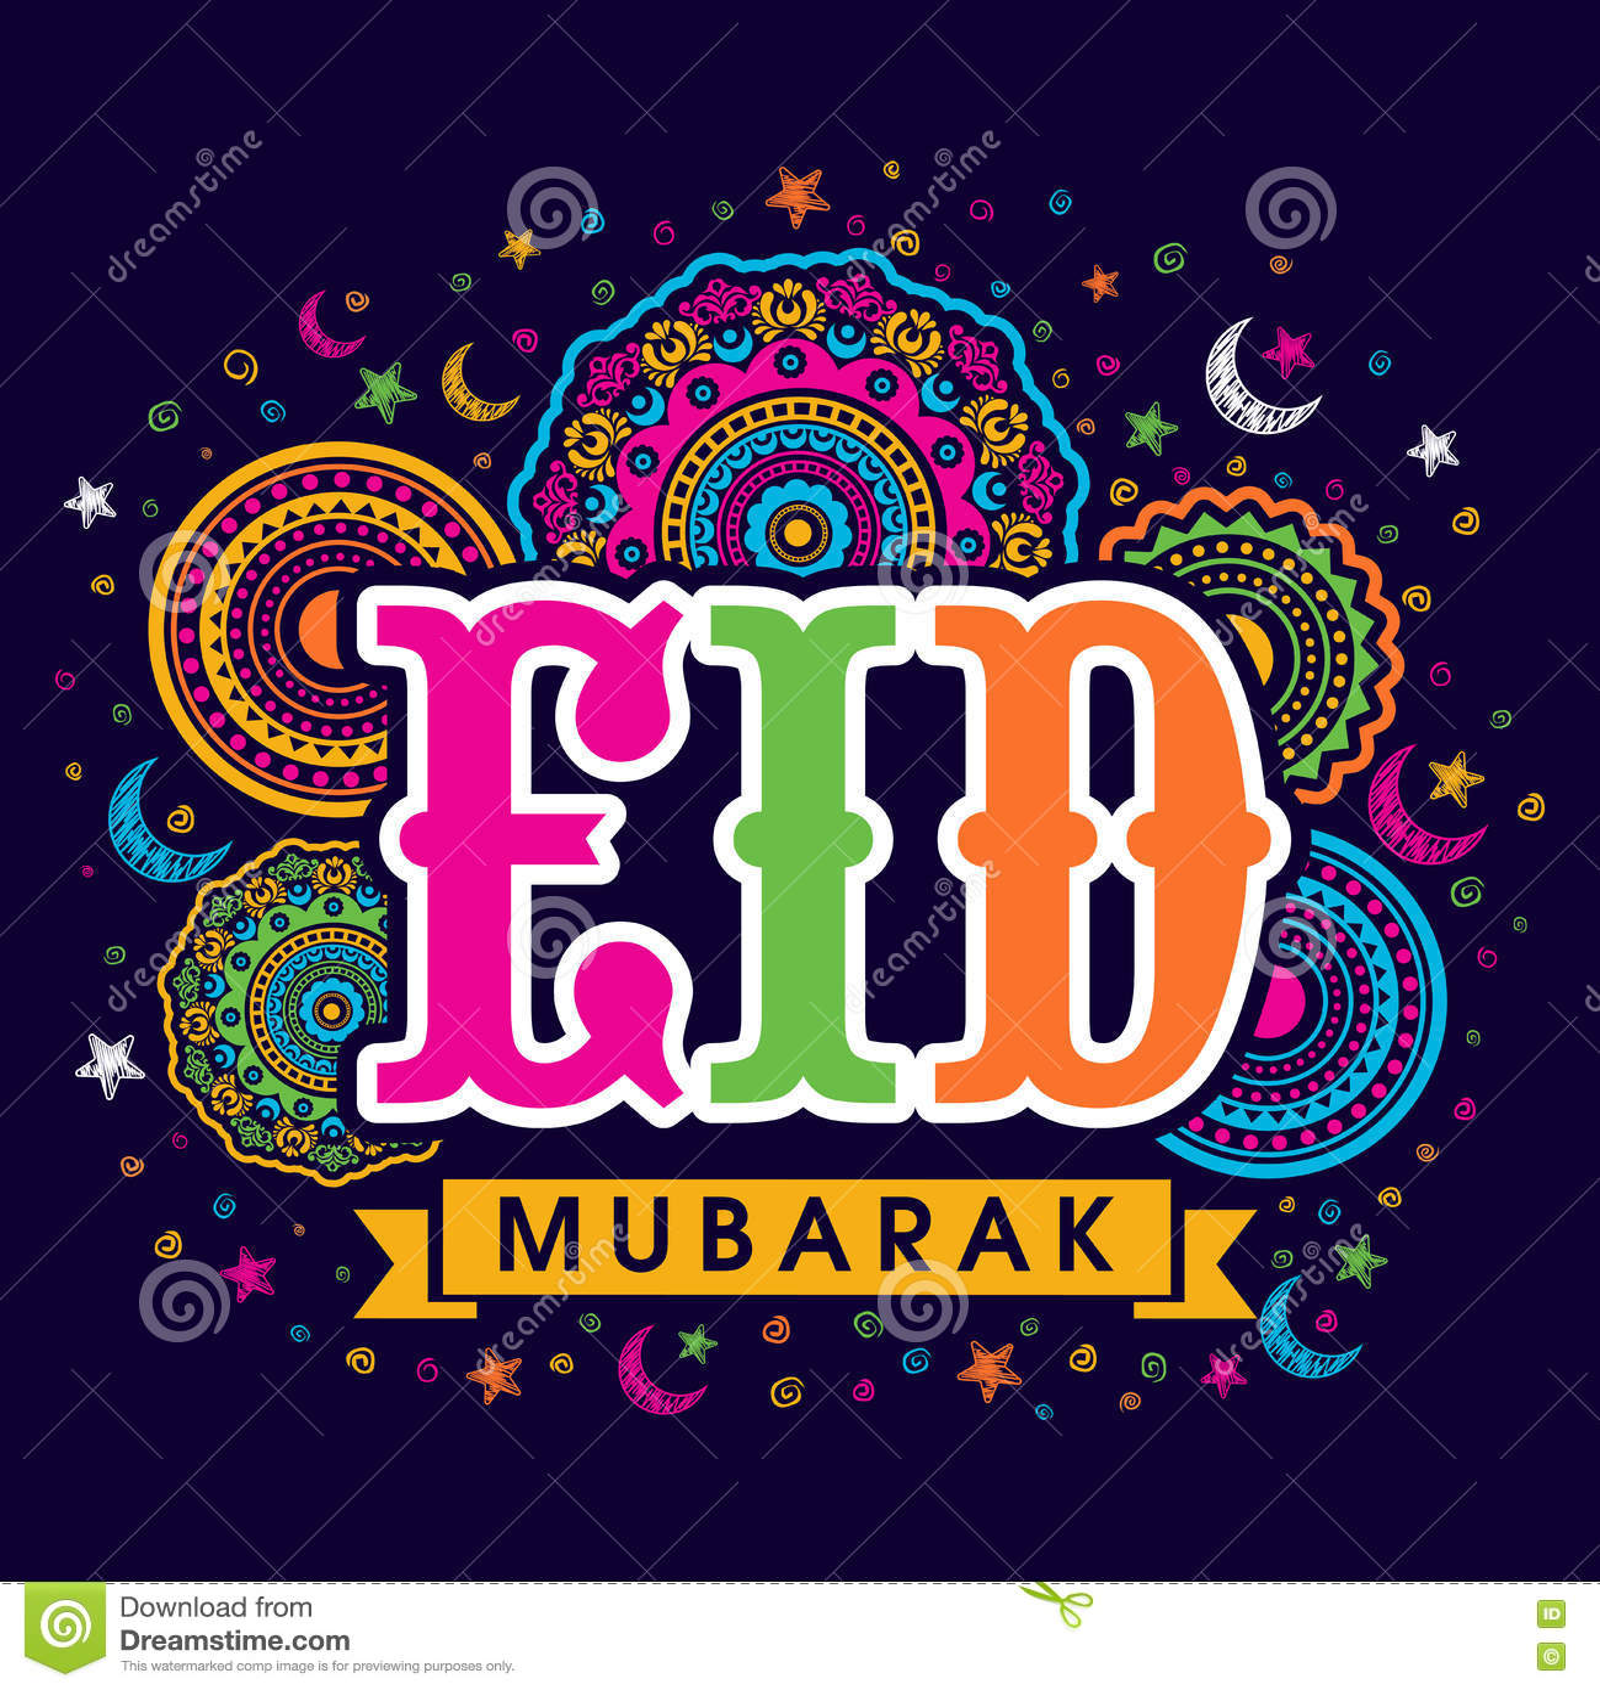 Greeting Card For Eid Mubarak Celebration Stock Illustration